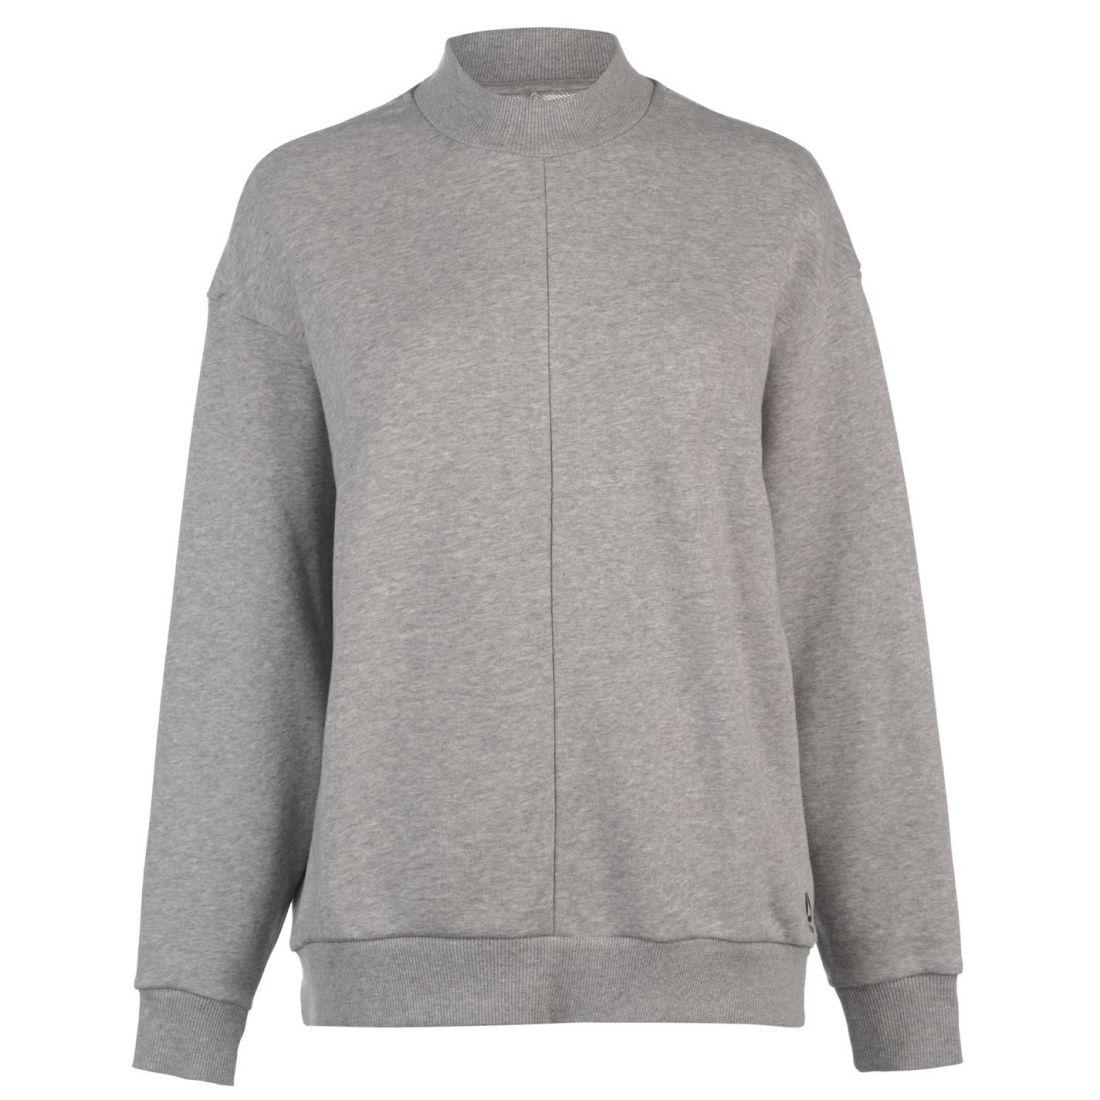 9f3199c46f6ec Details about Reebok EE Crew Neck Sweatshirt Ladies Performance Hoodie T  Shirt Tee Top Jumper